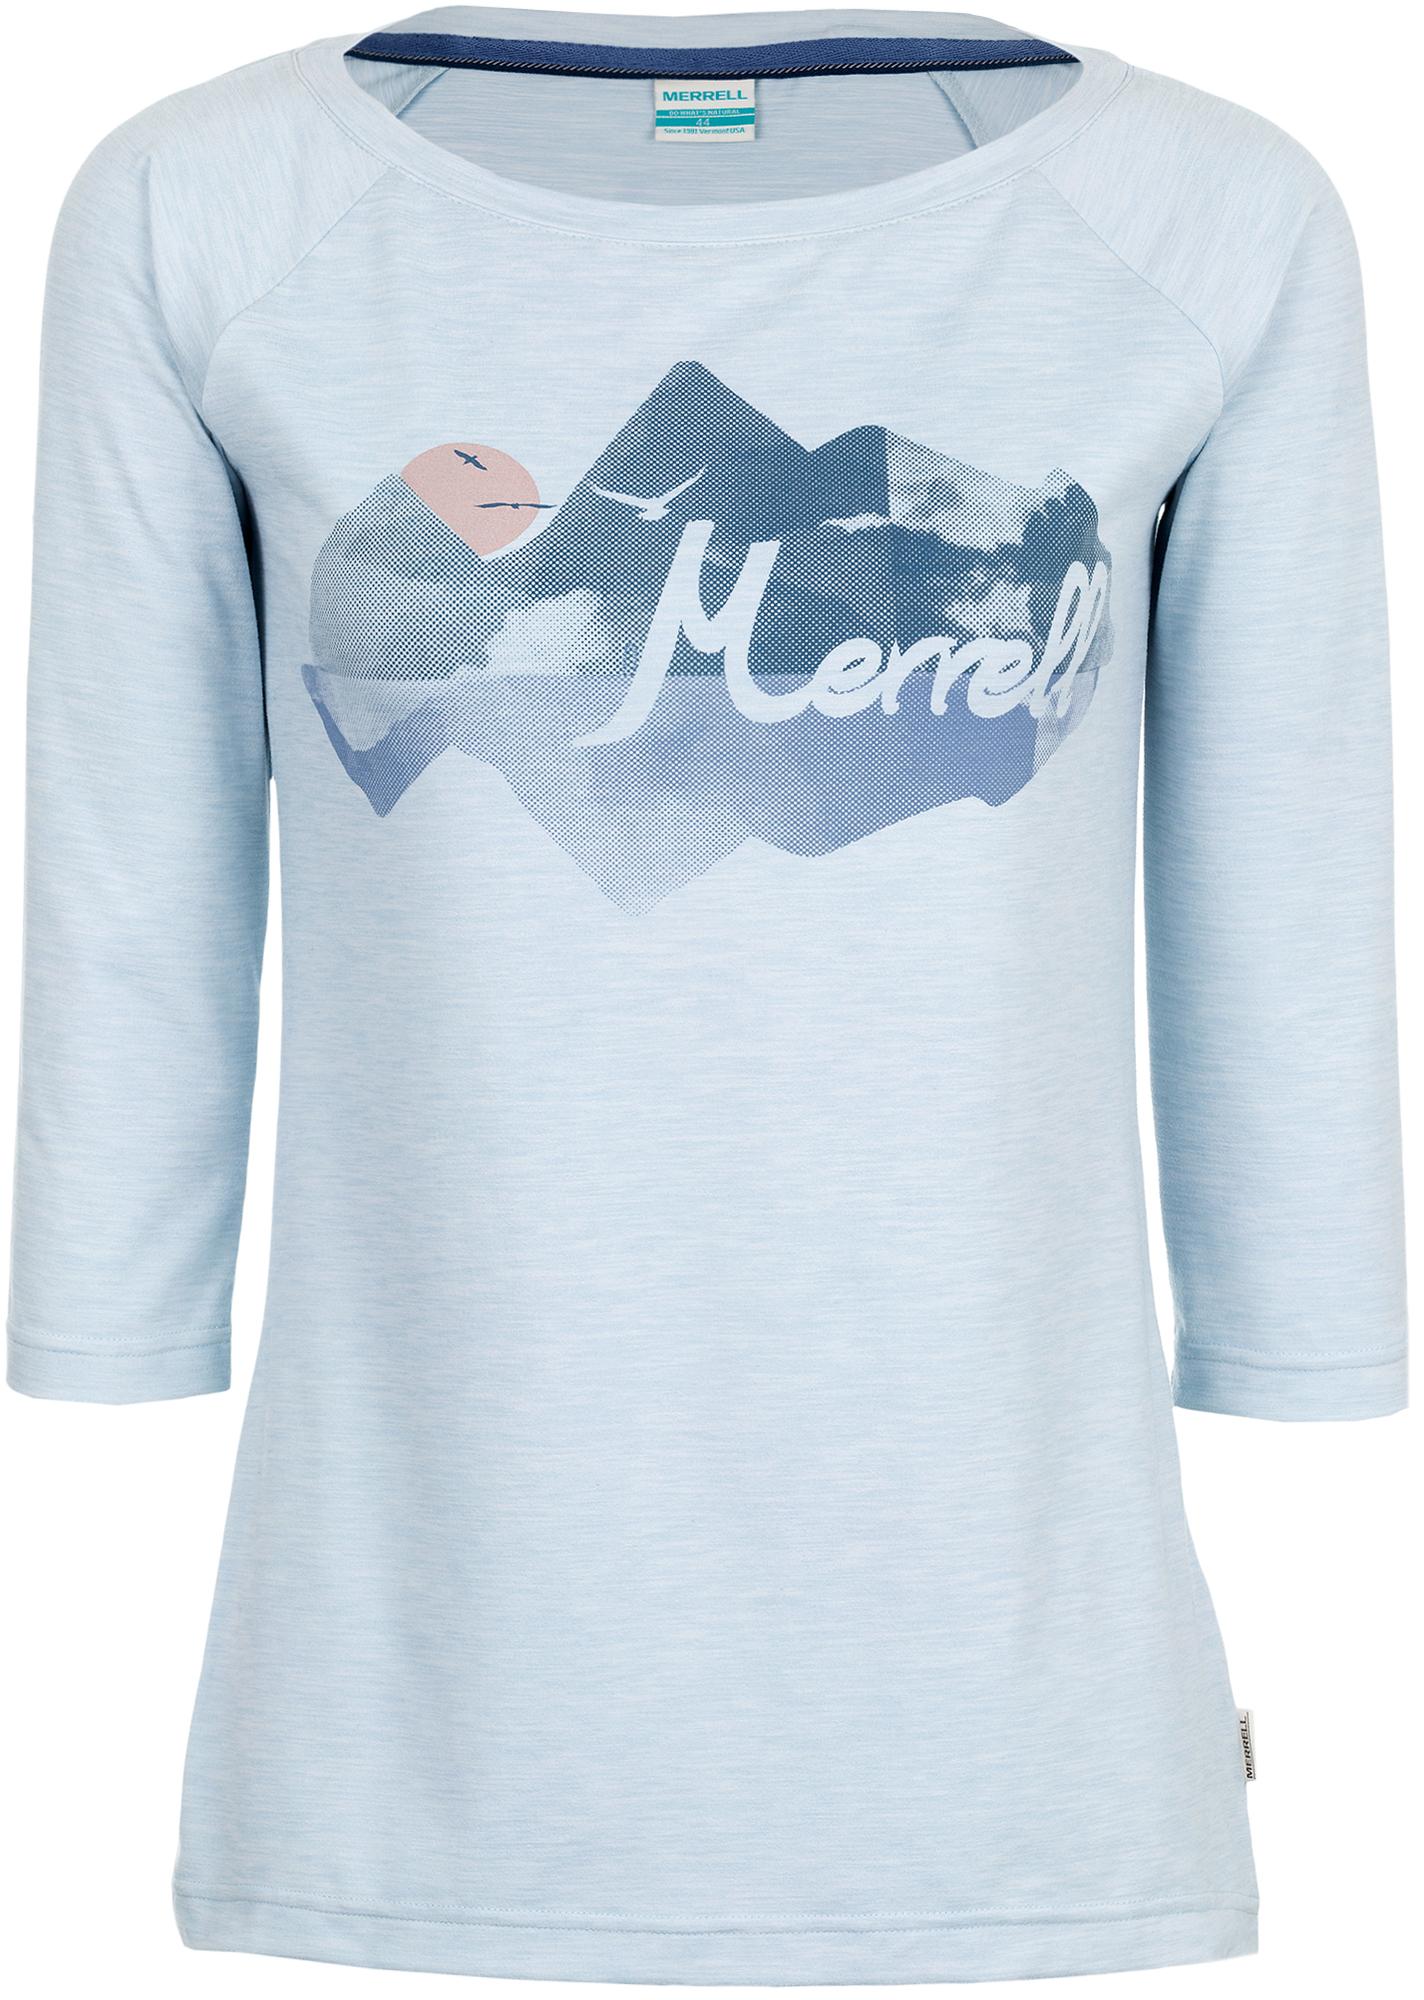 Merrell Футболка с длинным рукавом женская Merrell Iazyges футболка с длинным рукавом tommy hilfiger футболка с длинным рукавом